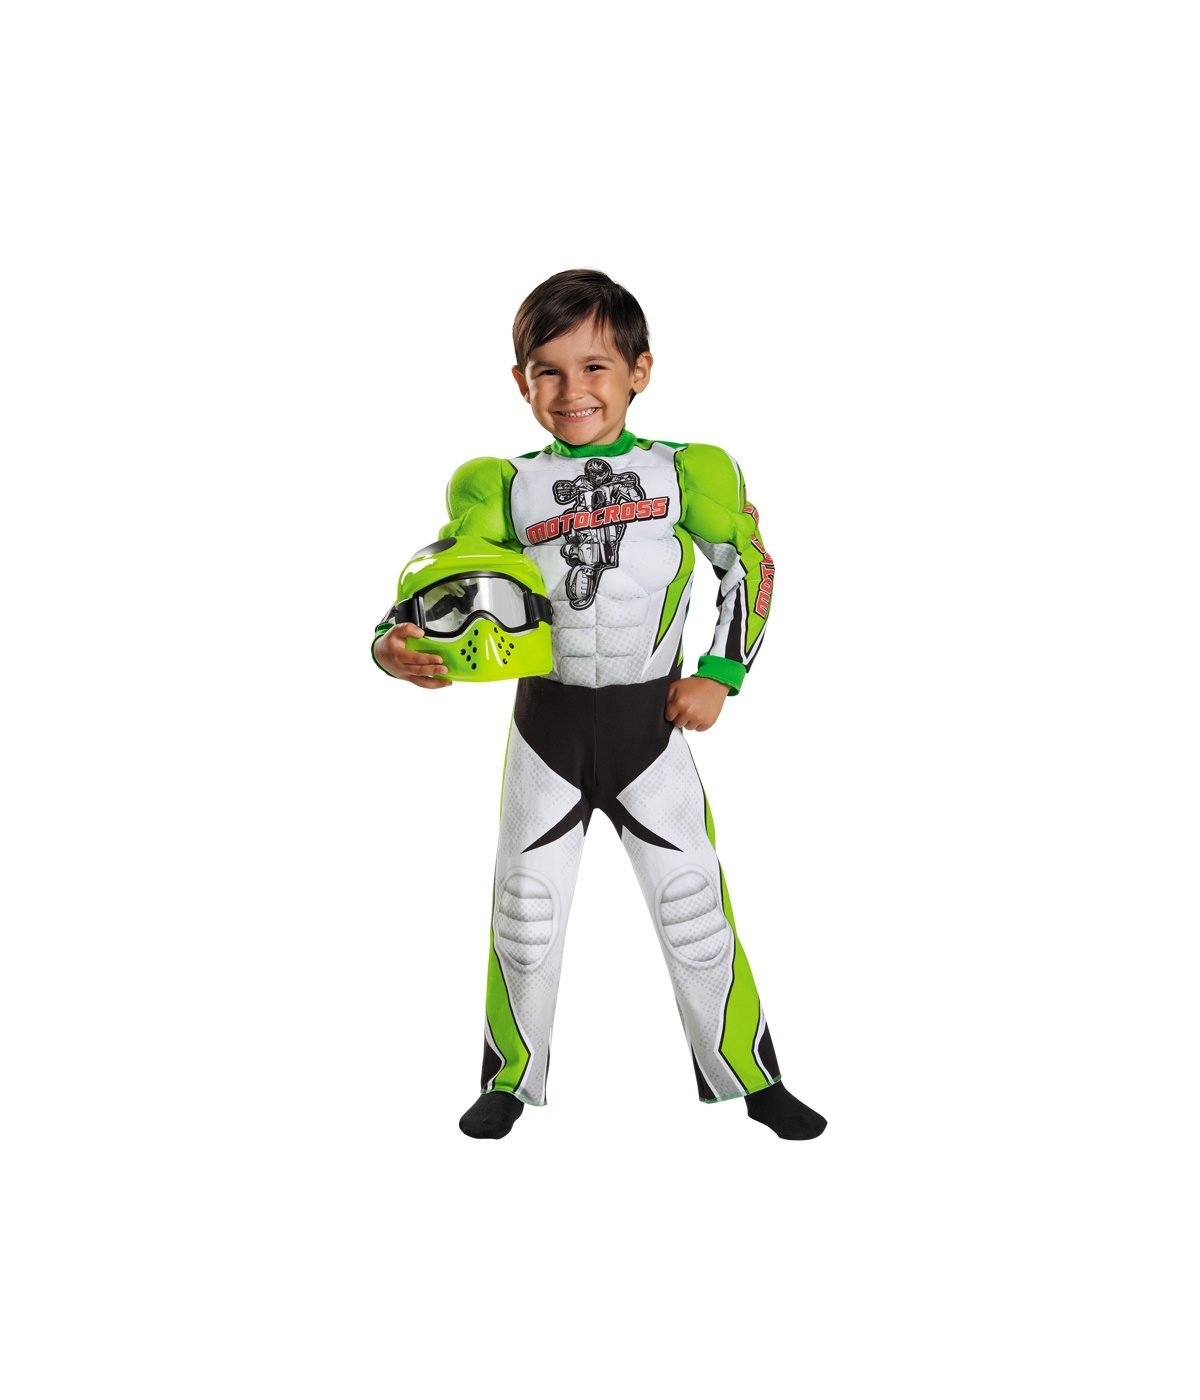 Grave Digger Race Car Driver Boy Costume - Boys Costume